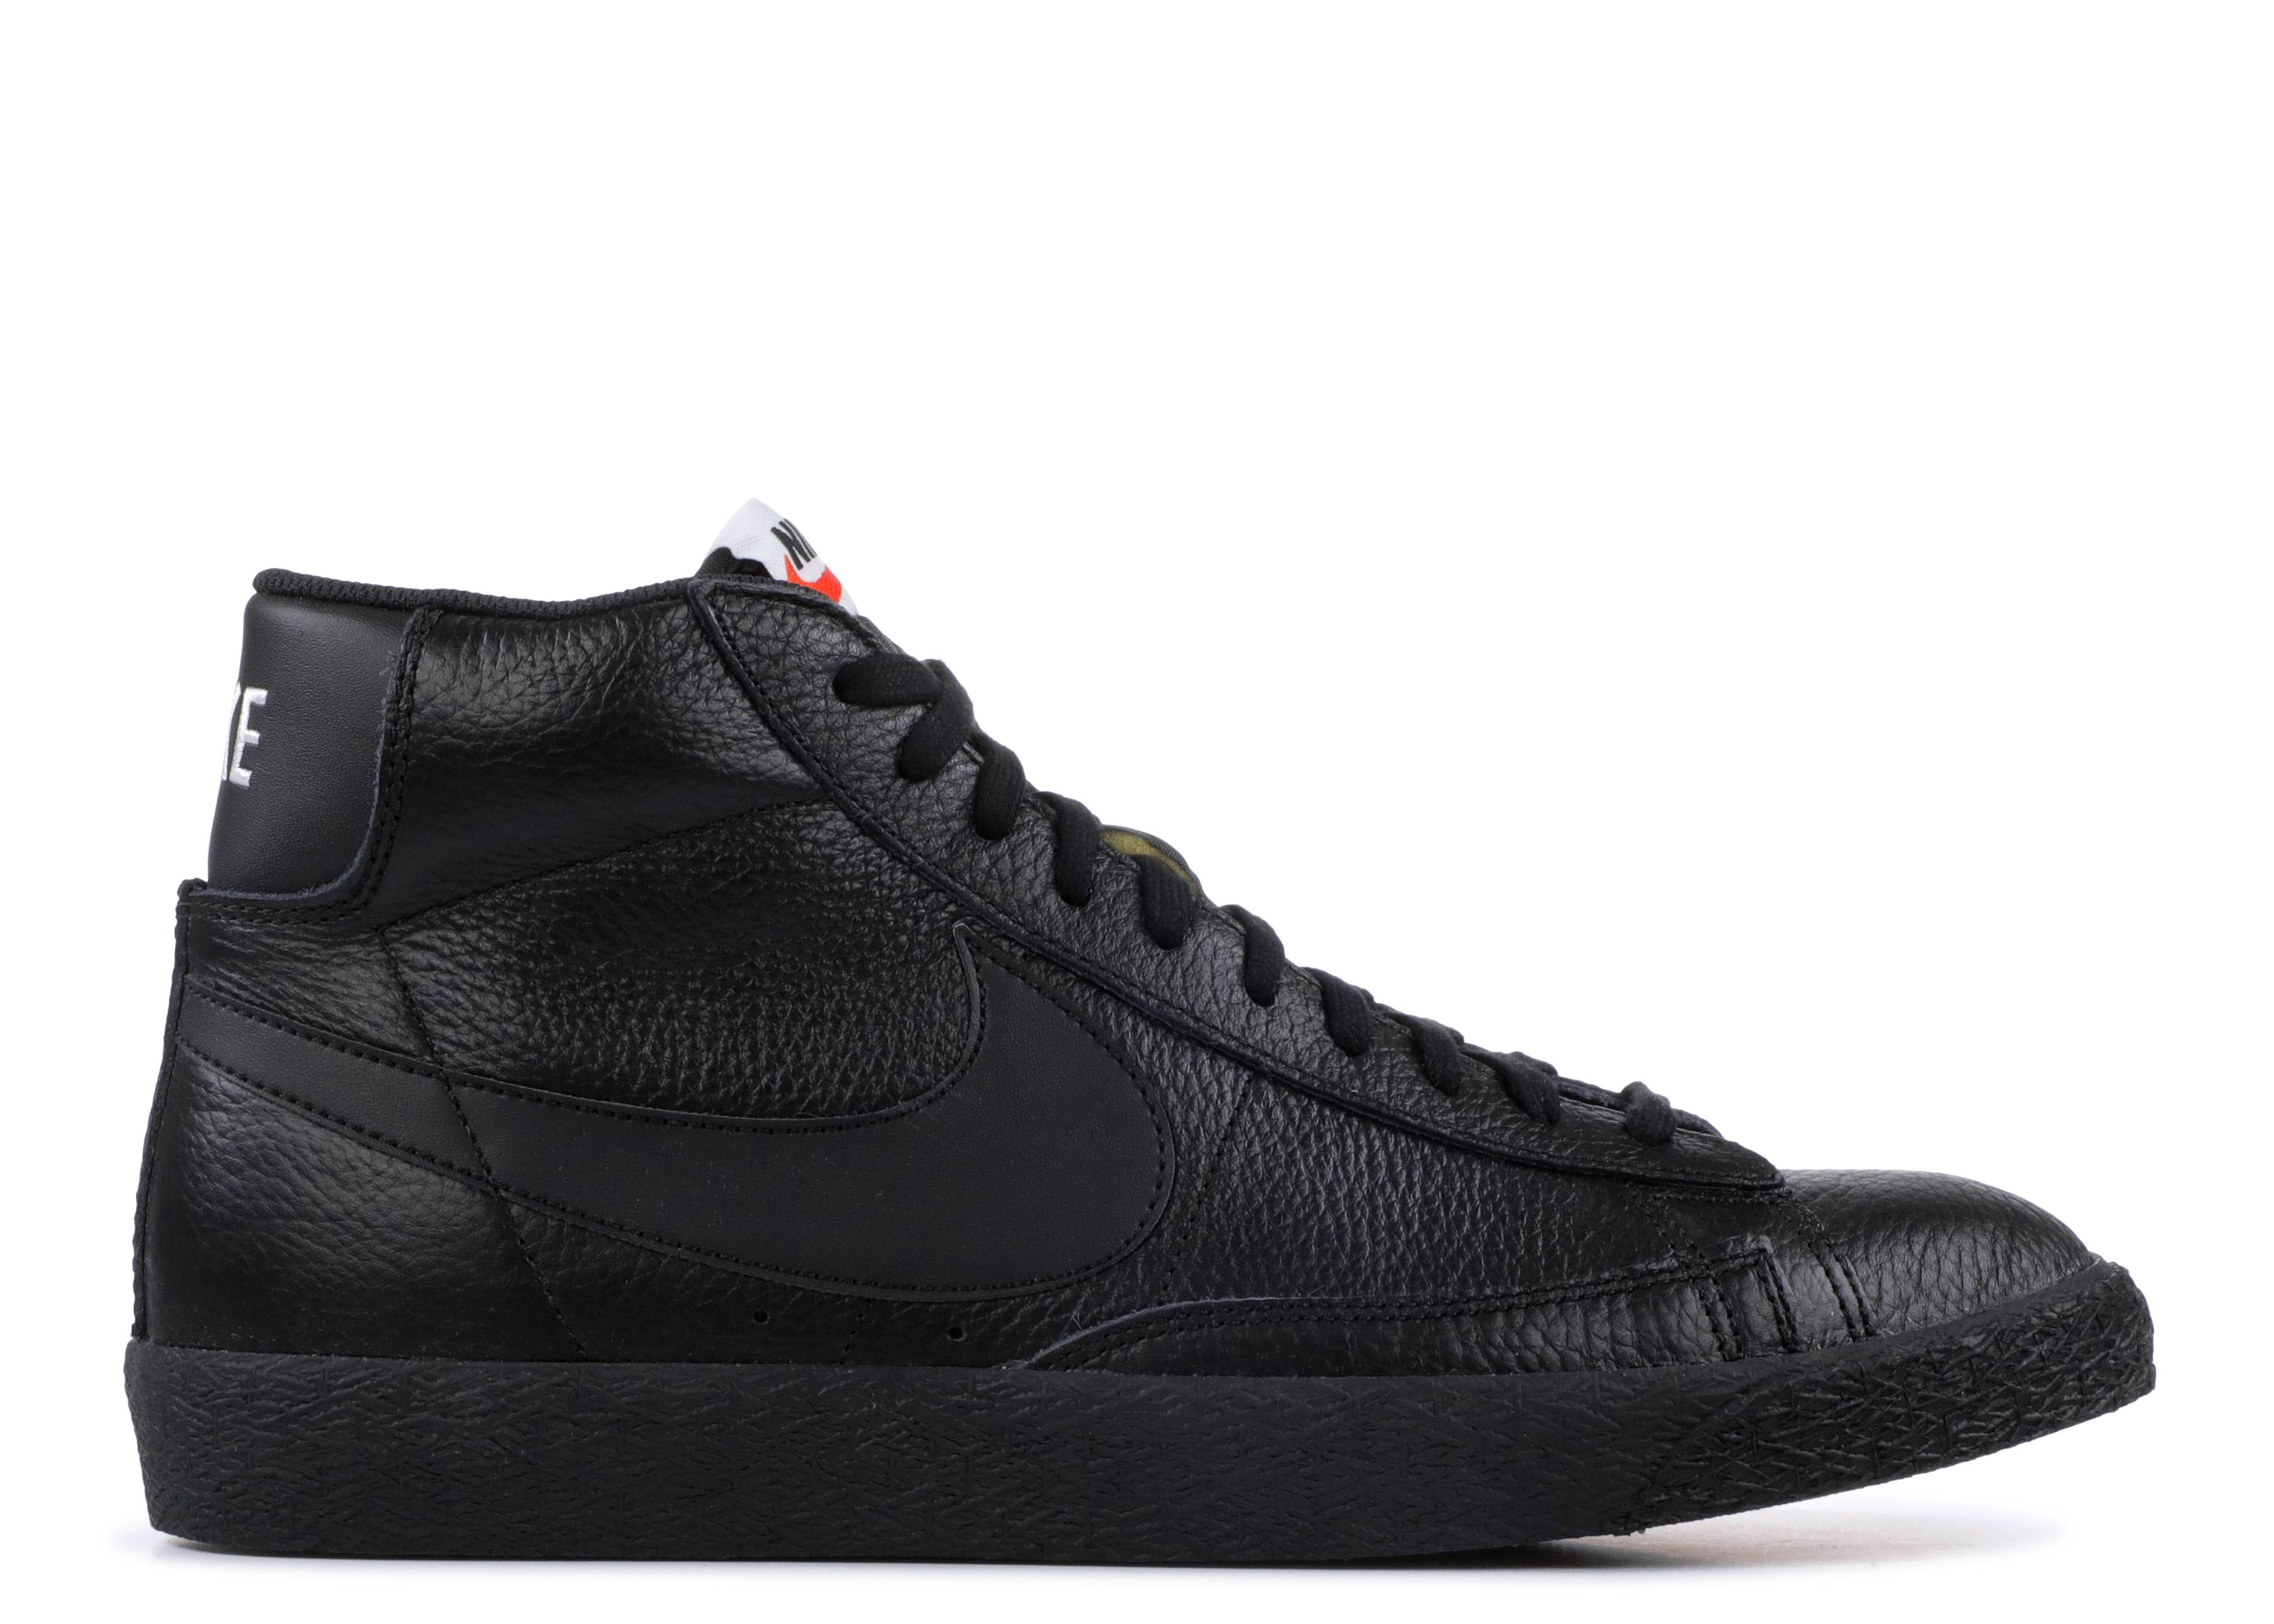 1c3f87ffc834 Blazer Mid Prm - Nike - 429988 007 - black black-white